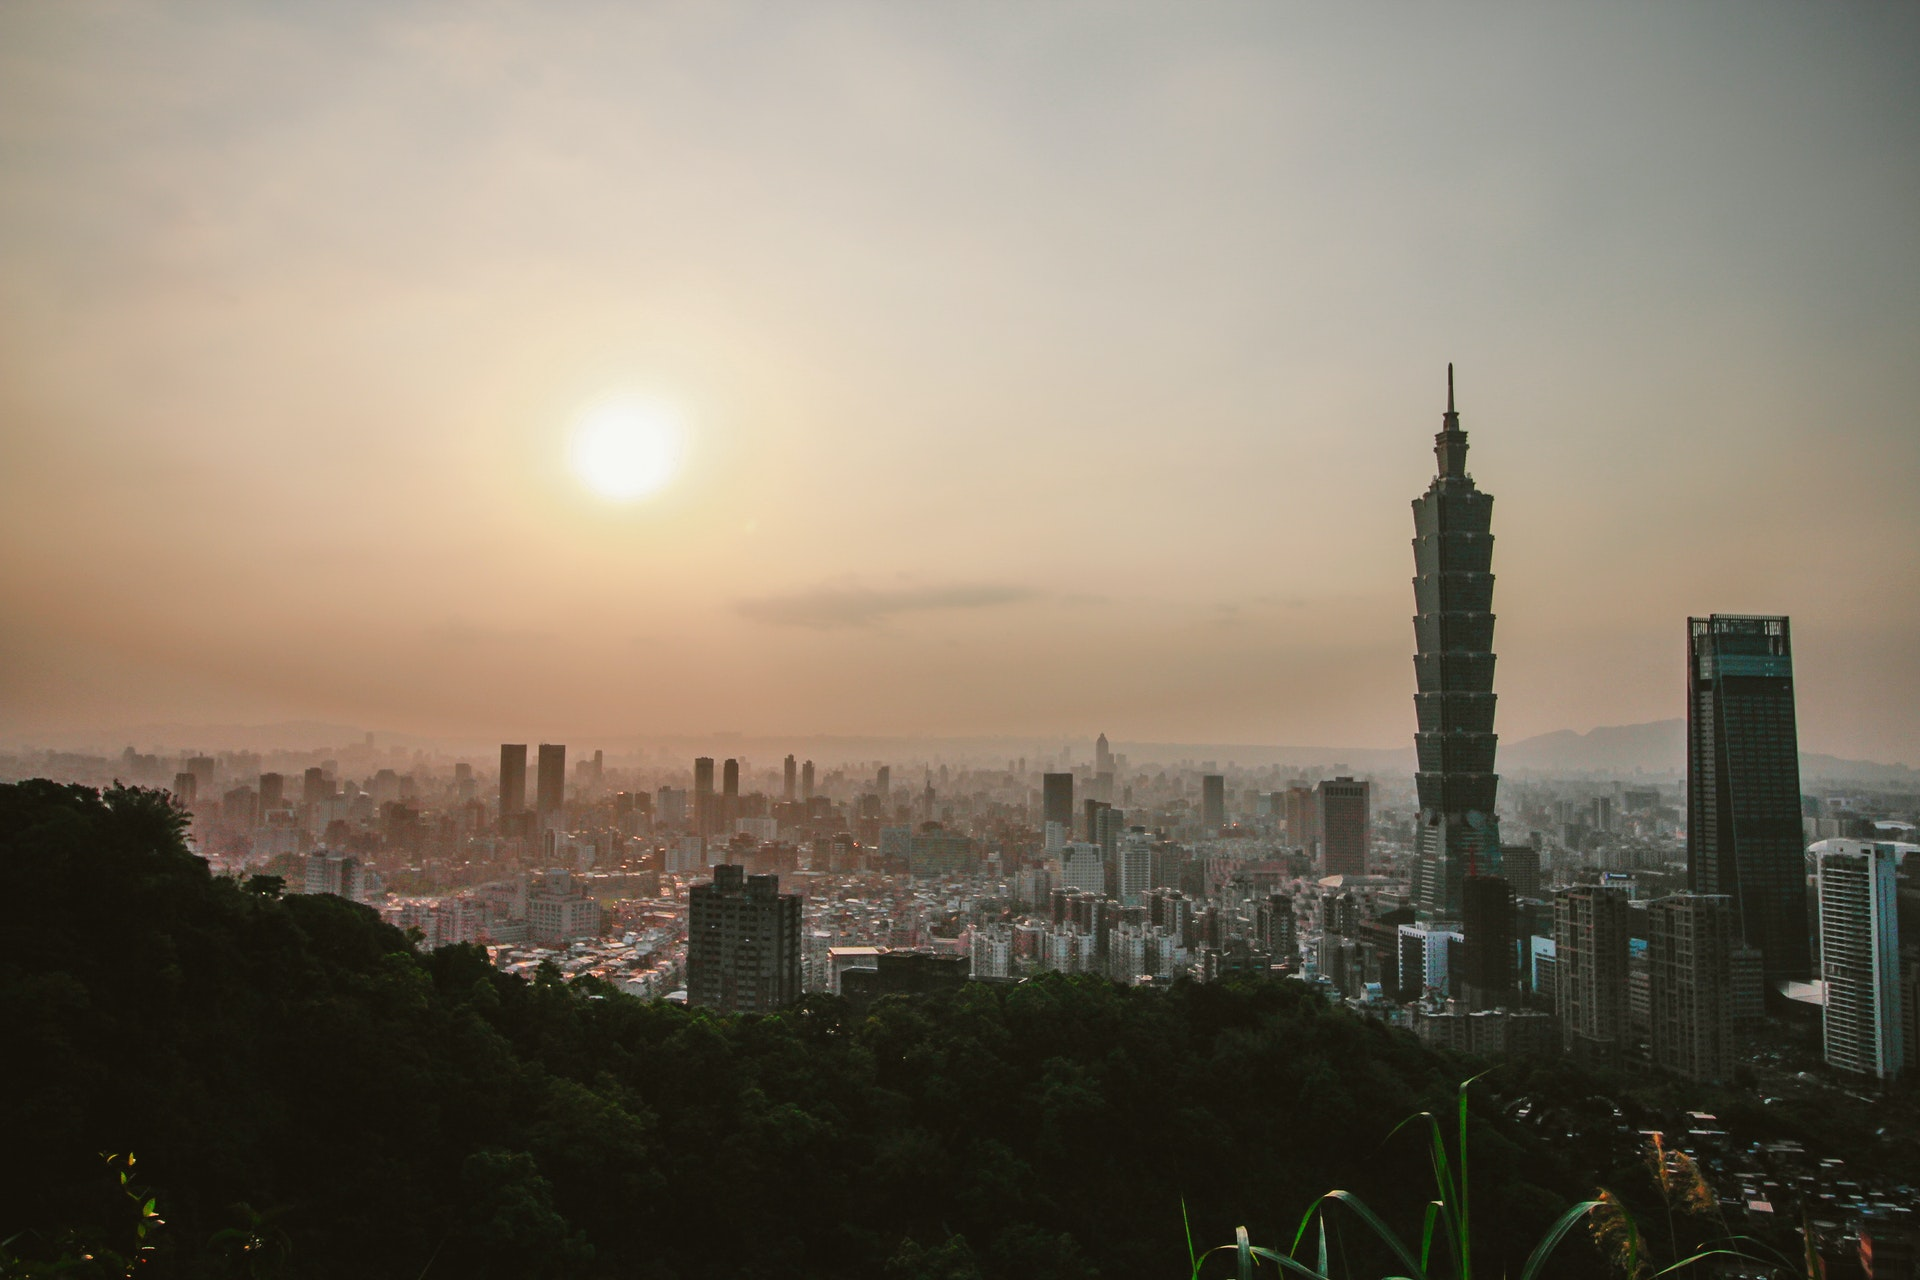 MCU(莫斯科市立大学)学生了解台湾的教